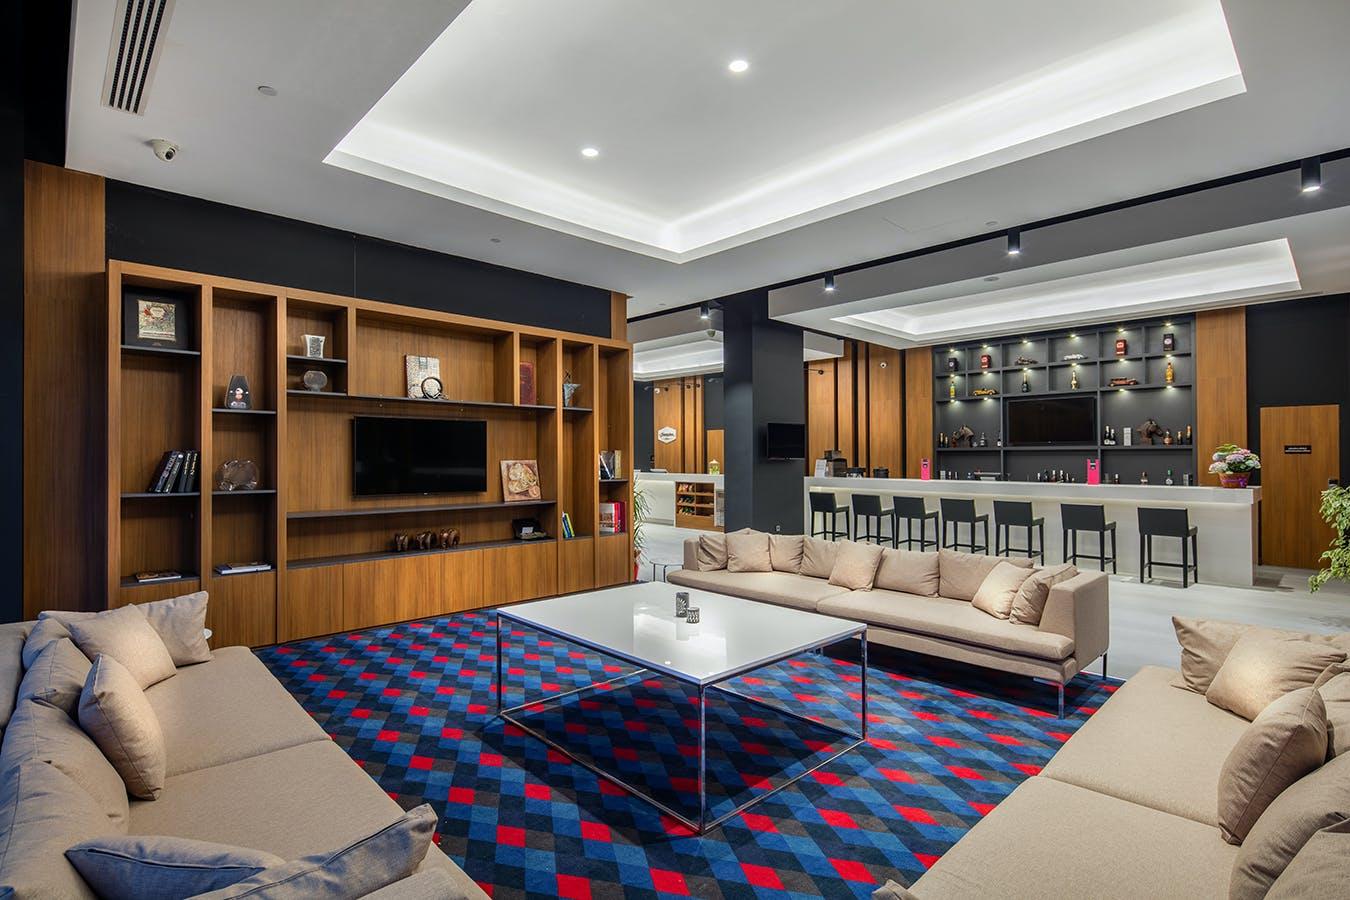 242 Residents | Aliaga - Next to Yenifoca Beach | Luxury Modern Complex - Incl. Coworking + Gym